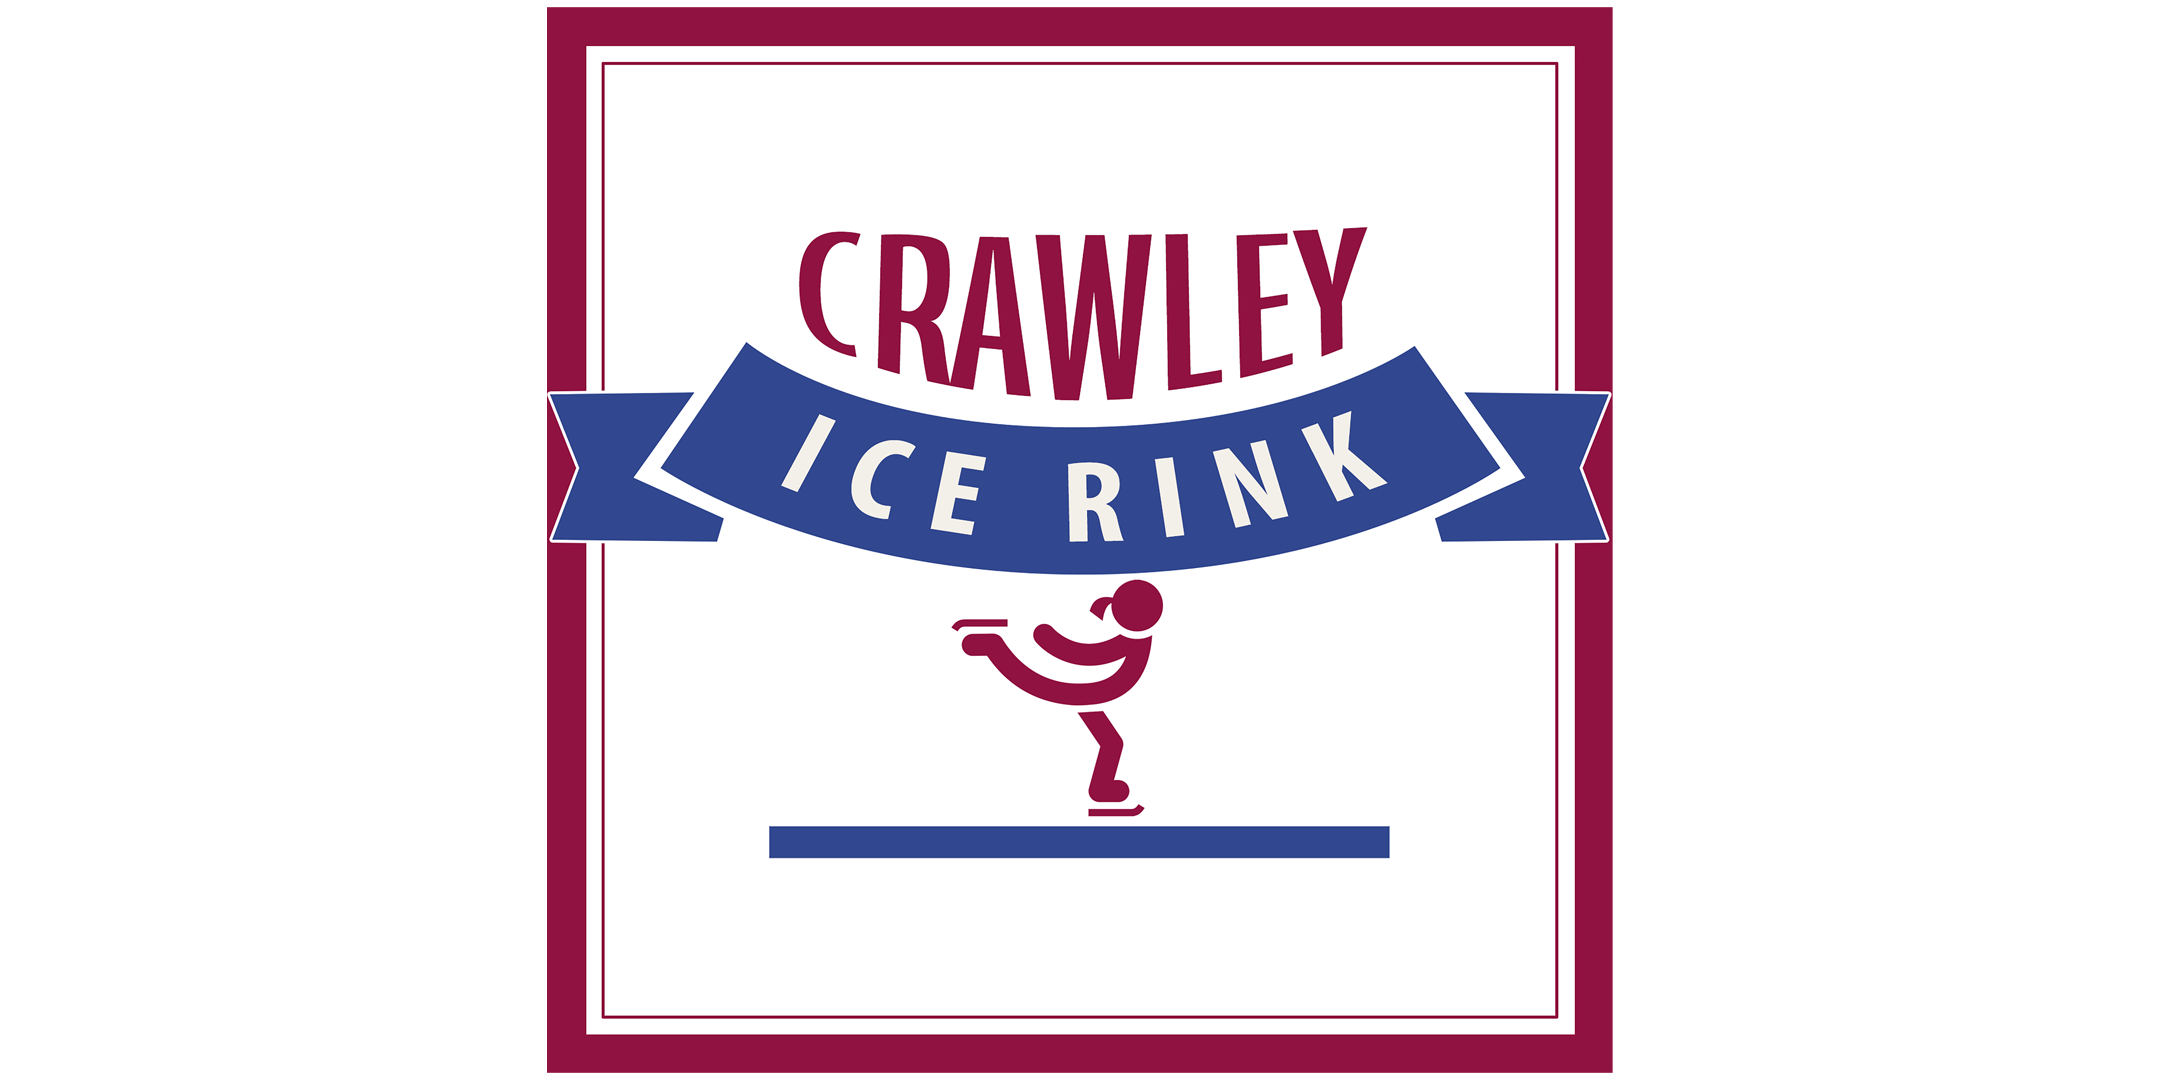 Crawley Ice Rink - 22nd December (Off Peak)